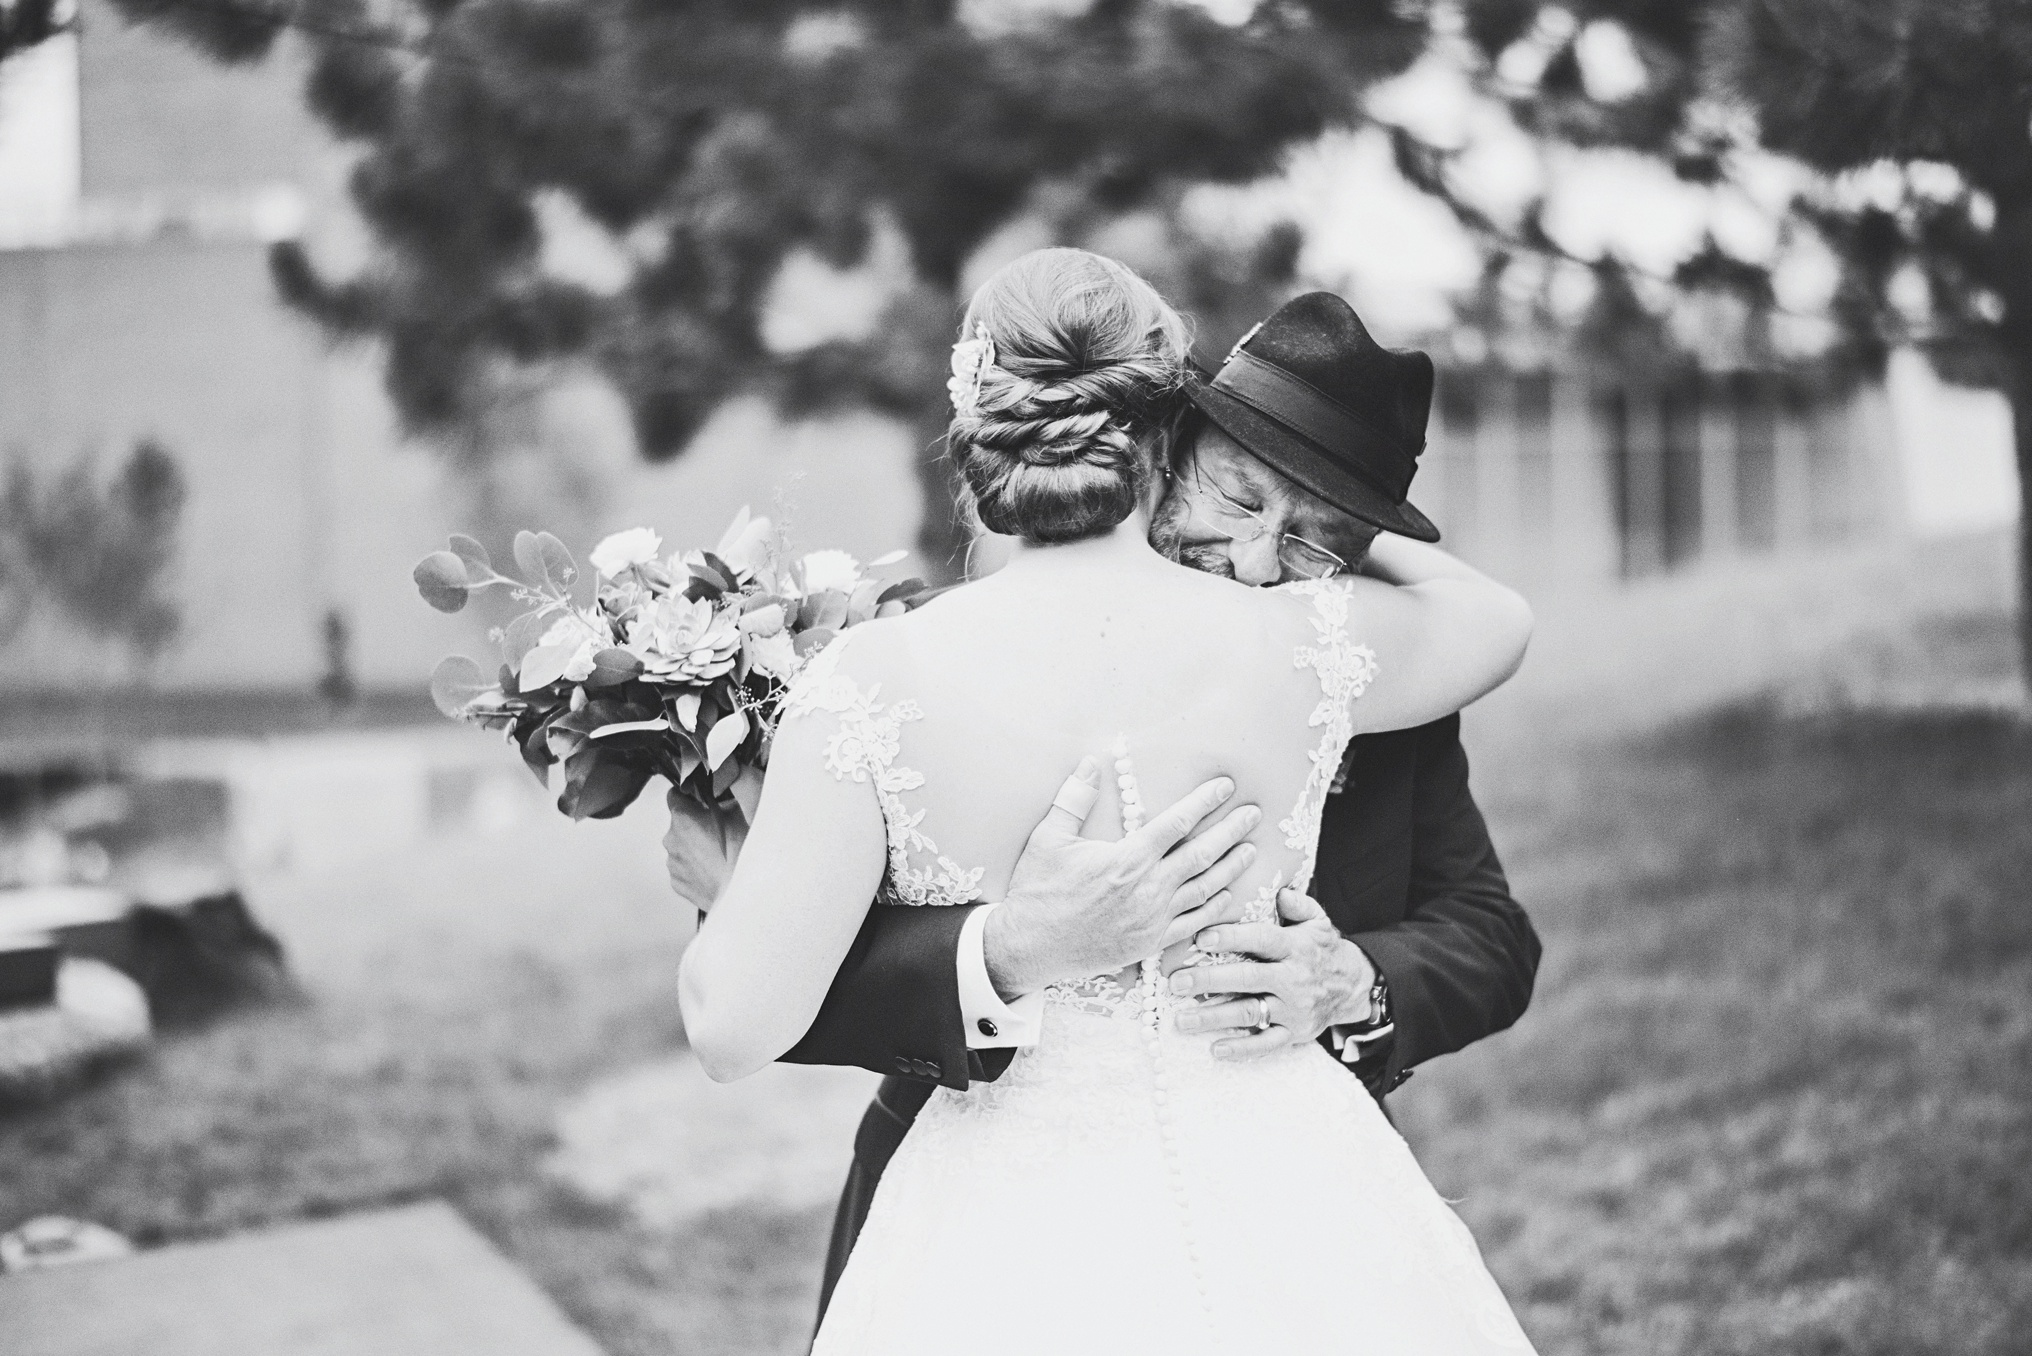 best_wedding_photography_2017_by_lucas_botz_photography_175.jpg